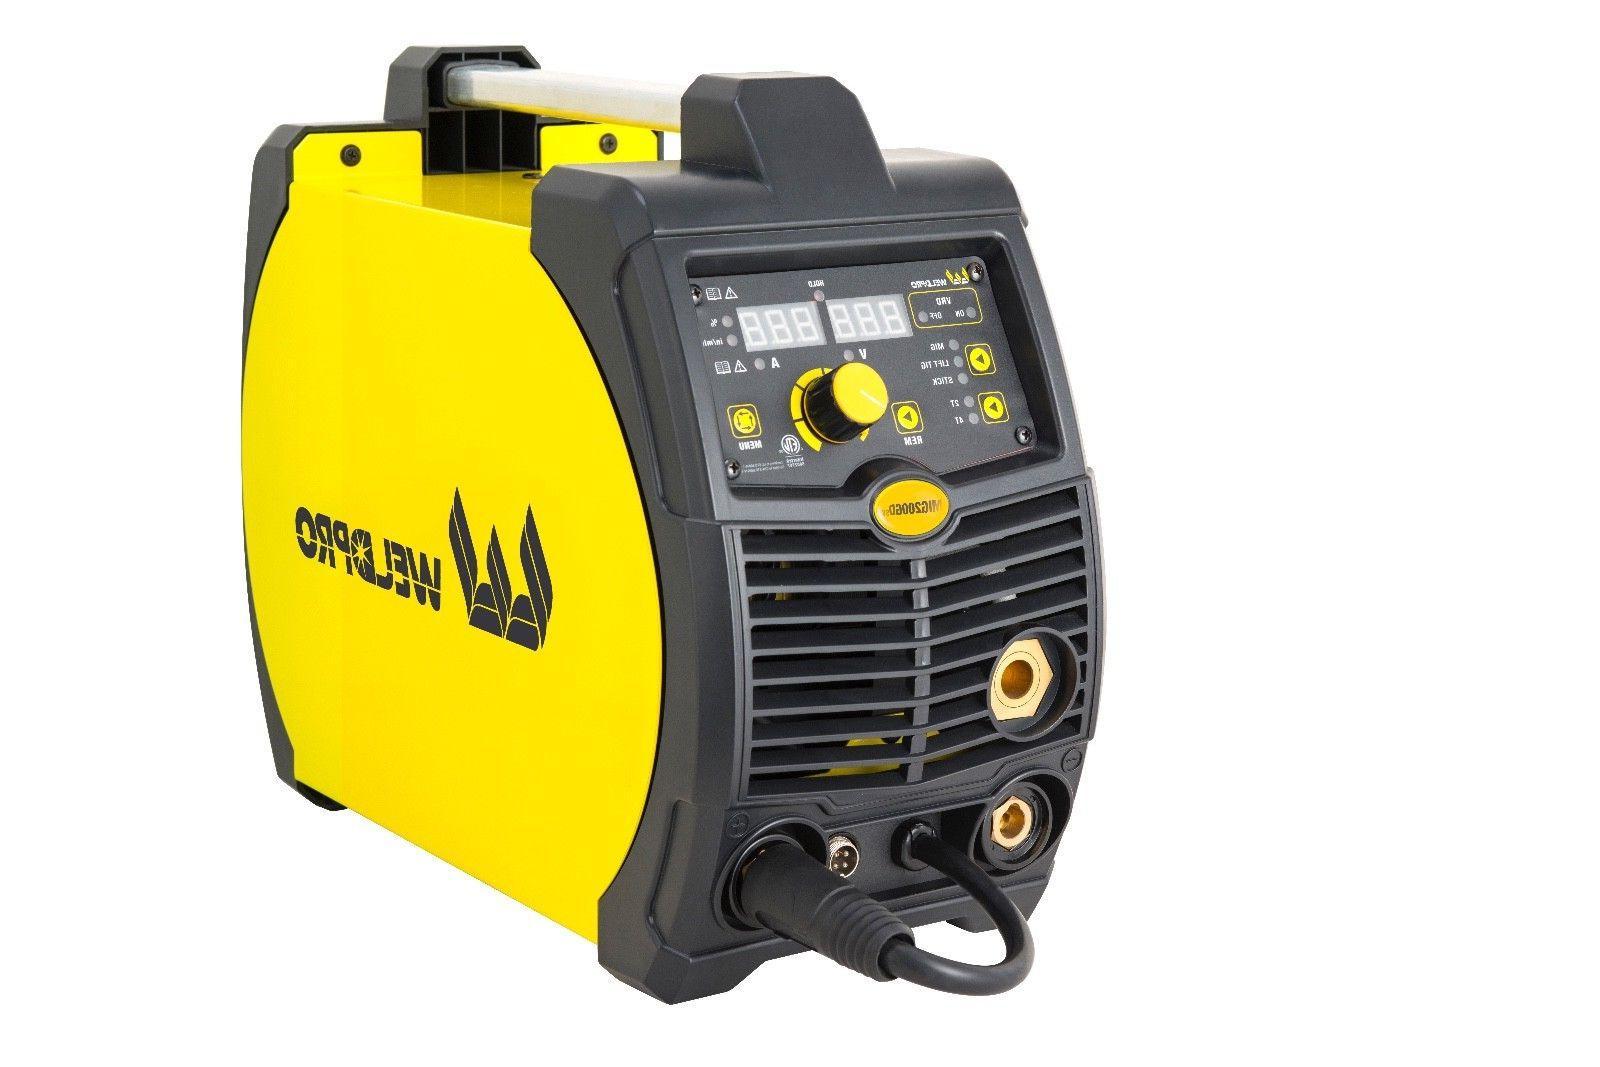 MIG200GDsv 200 Inverter Multi-Process Welder with Voltage